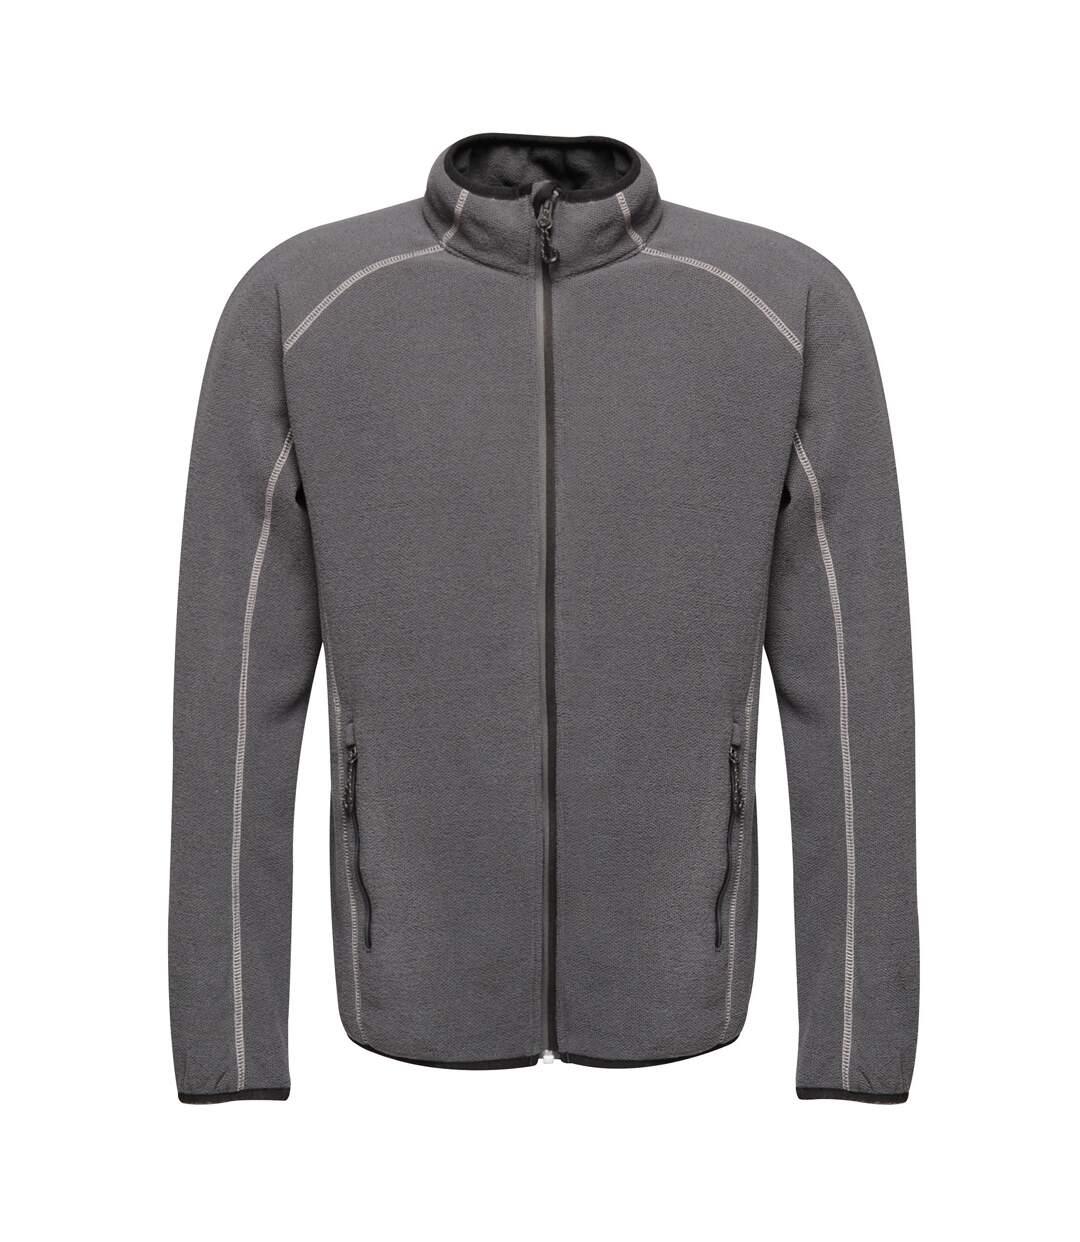 Regatta Mens Dreamstate Mini Honeycomb Fleece Jacket (Seal Grey) - UTPC3631